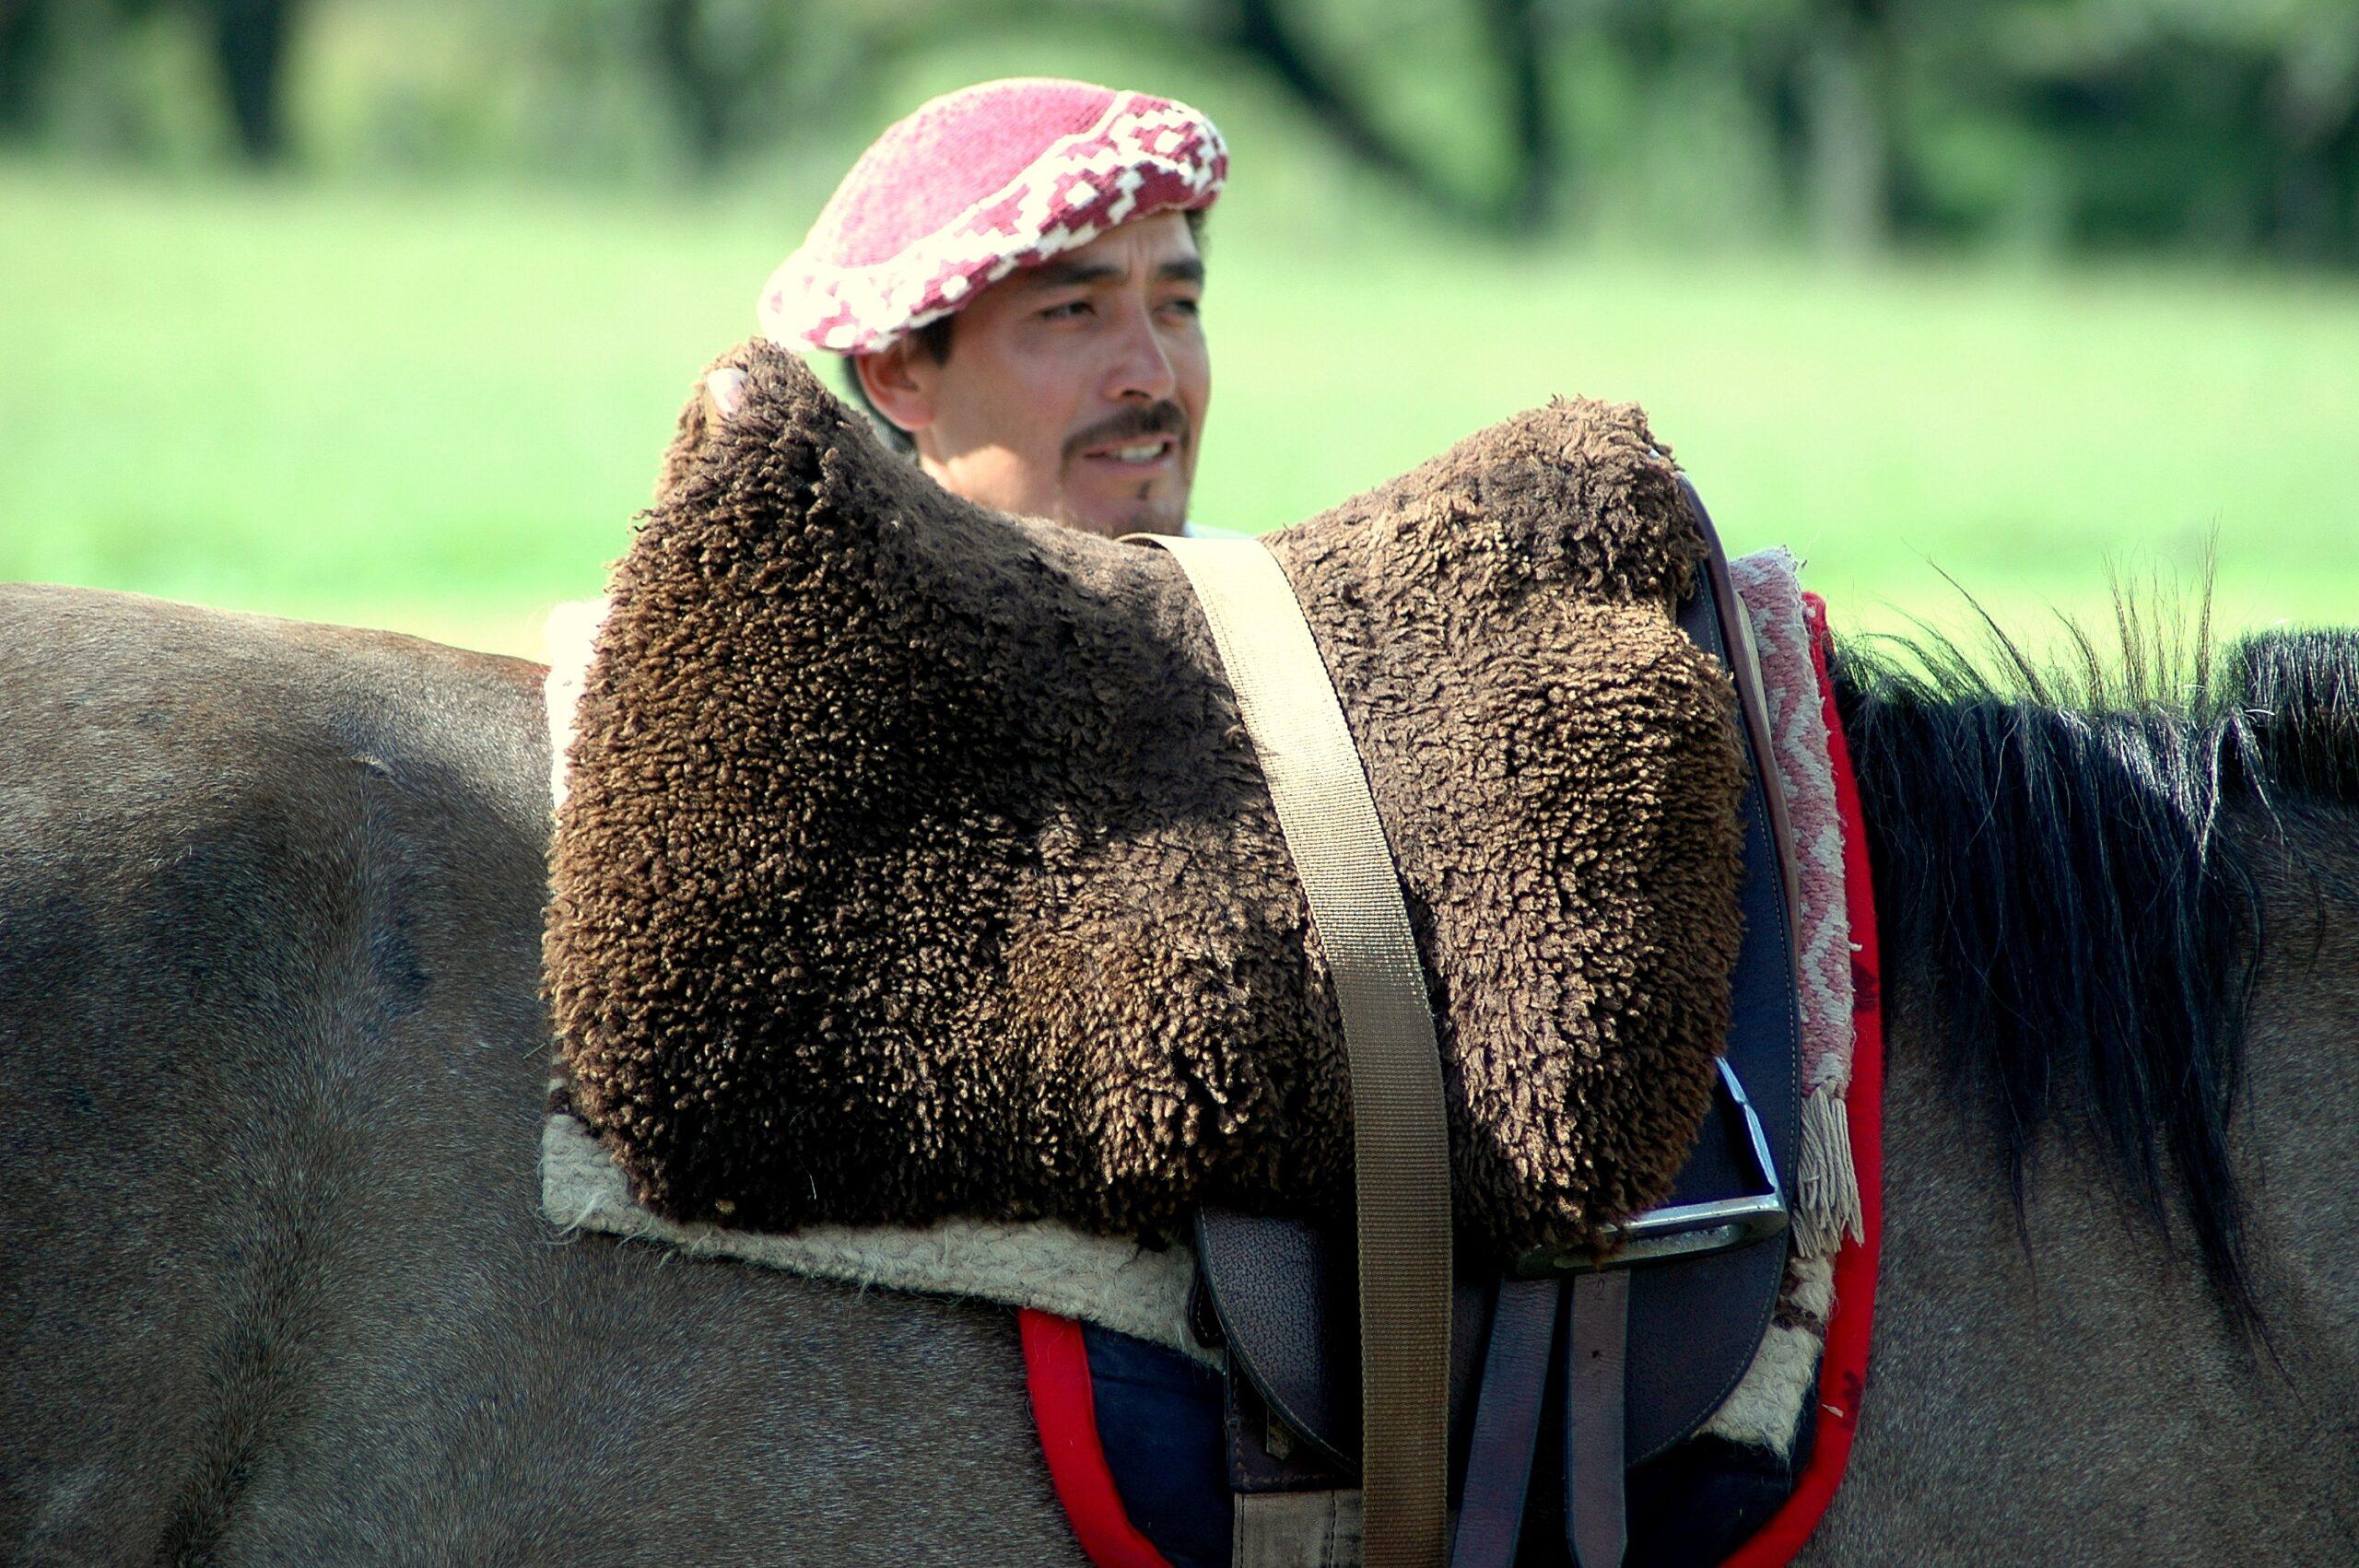 Gaucho's in Argentinië - Vakantie te paard / Reisbureau Perlan